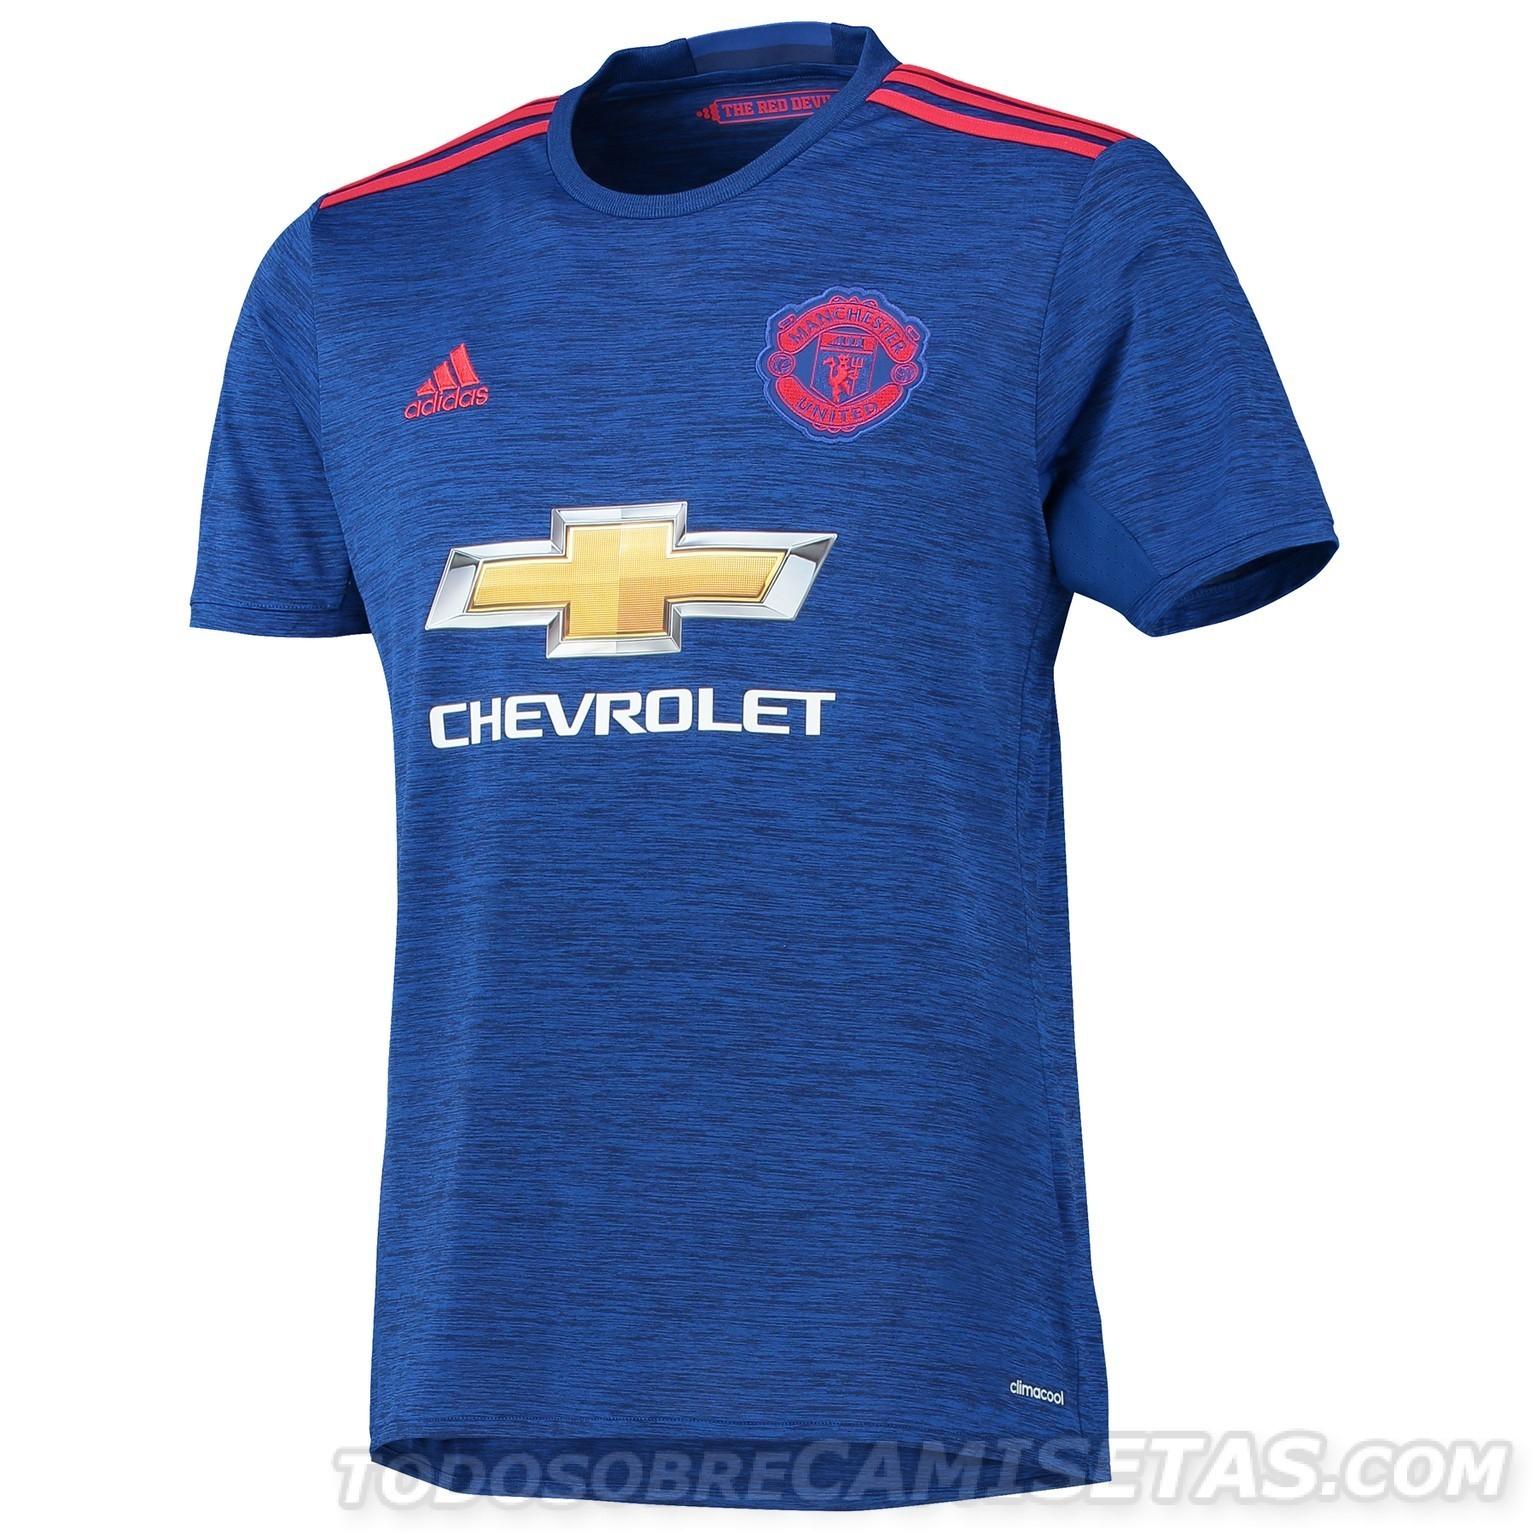 Manchester-United-2016-17-adidas-new-away-kit-4.jpg